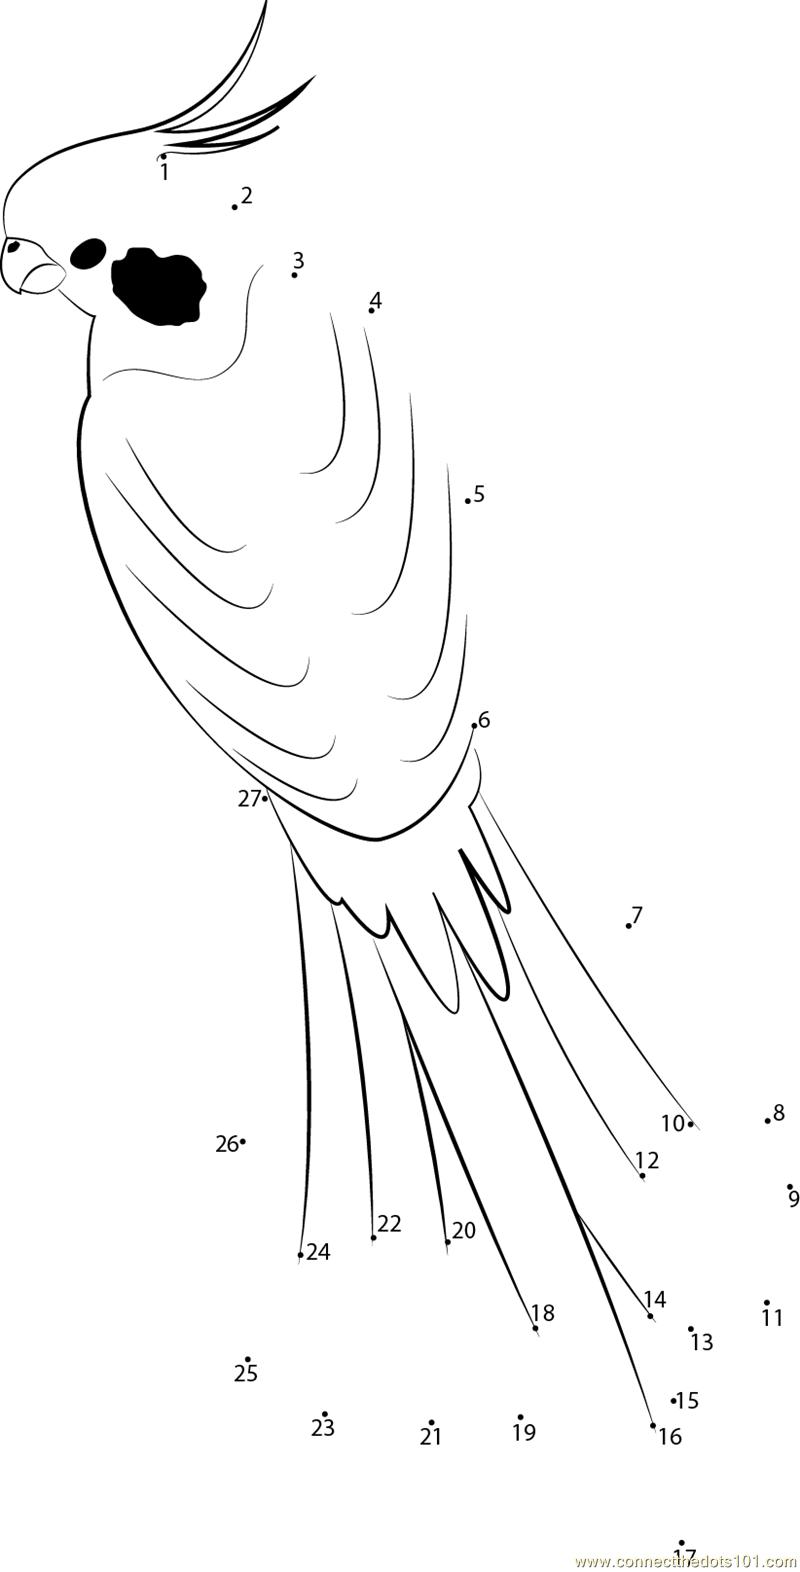 Male Cockatiel dot to dot printable